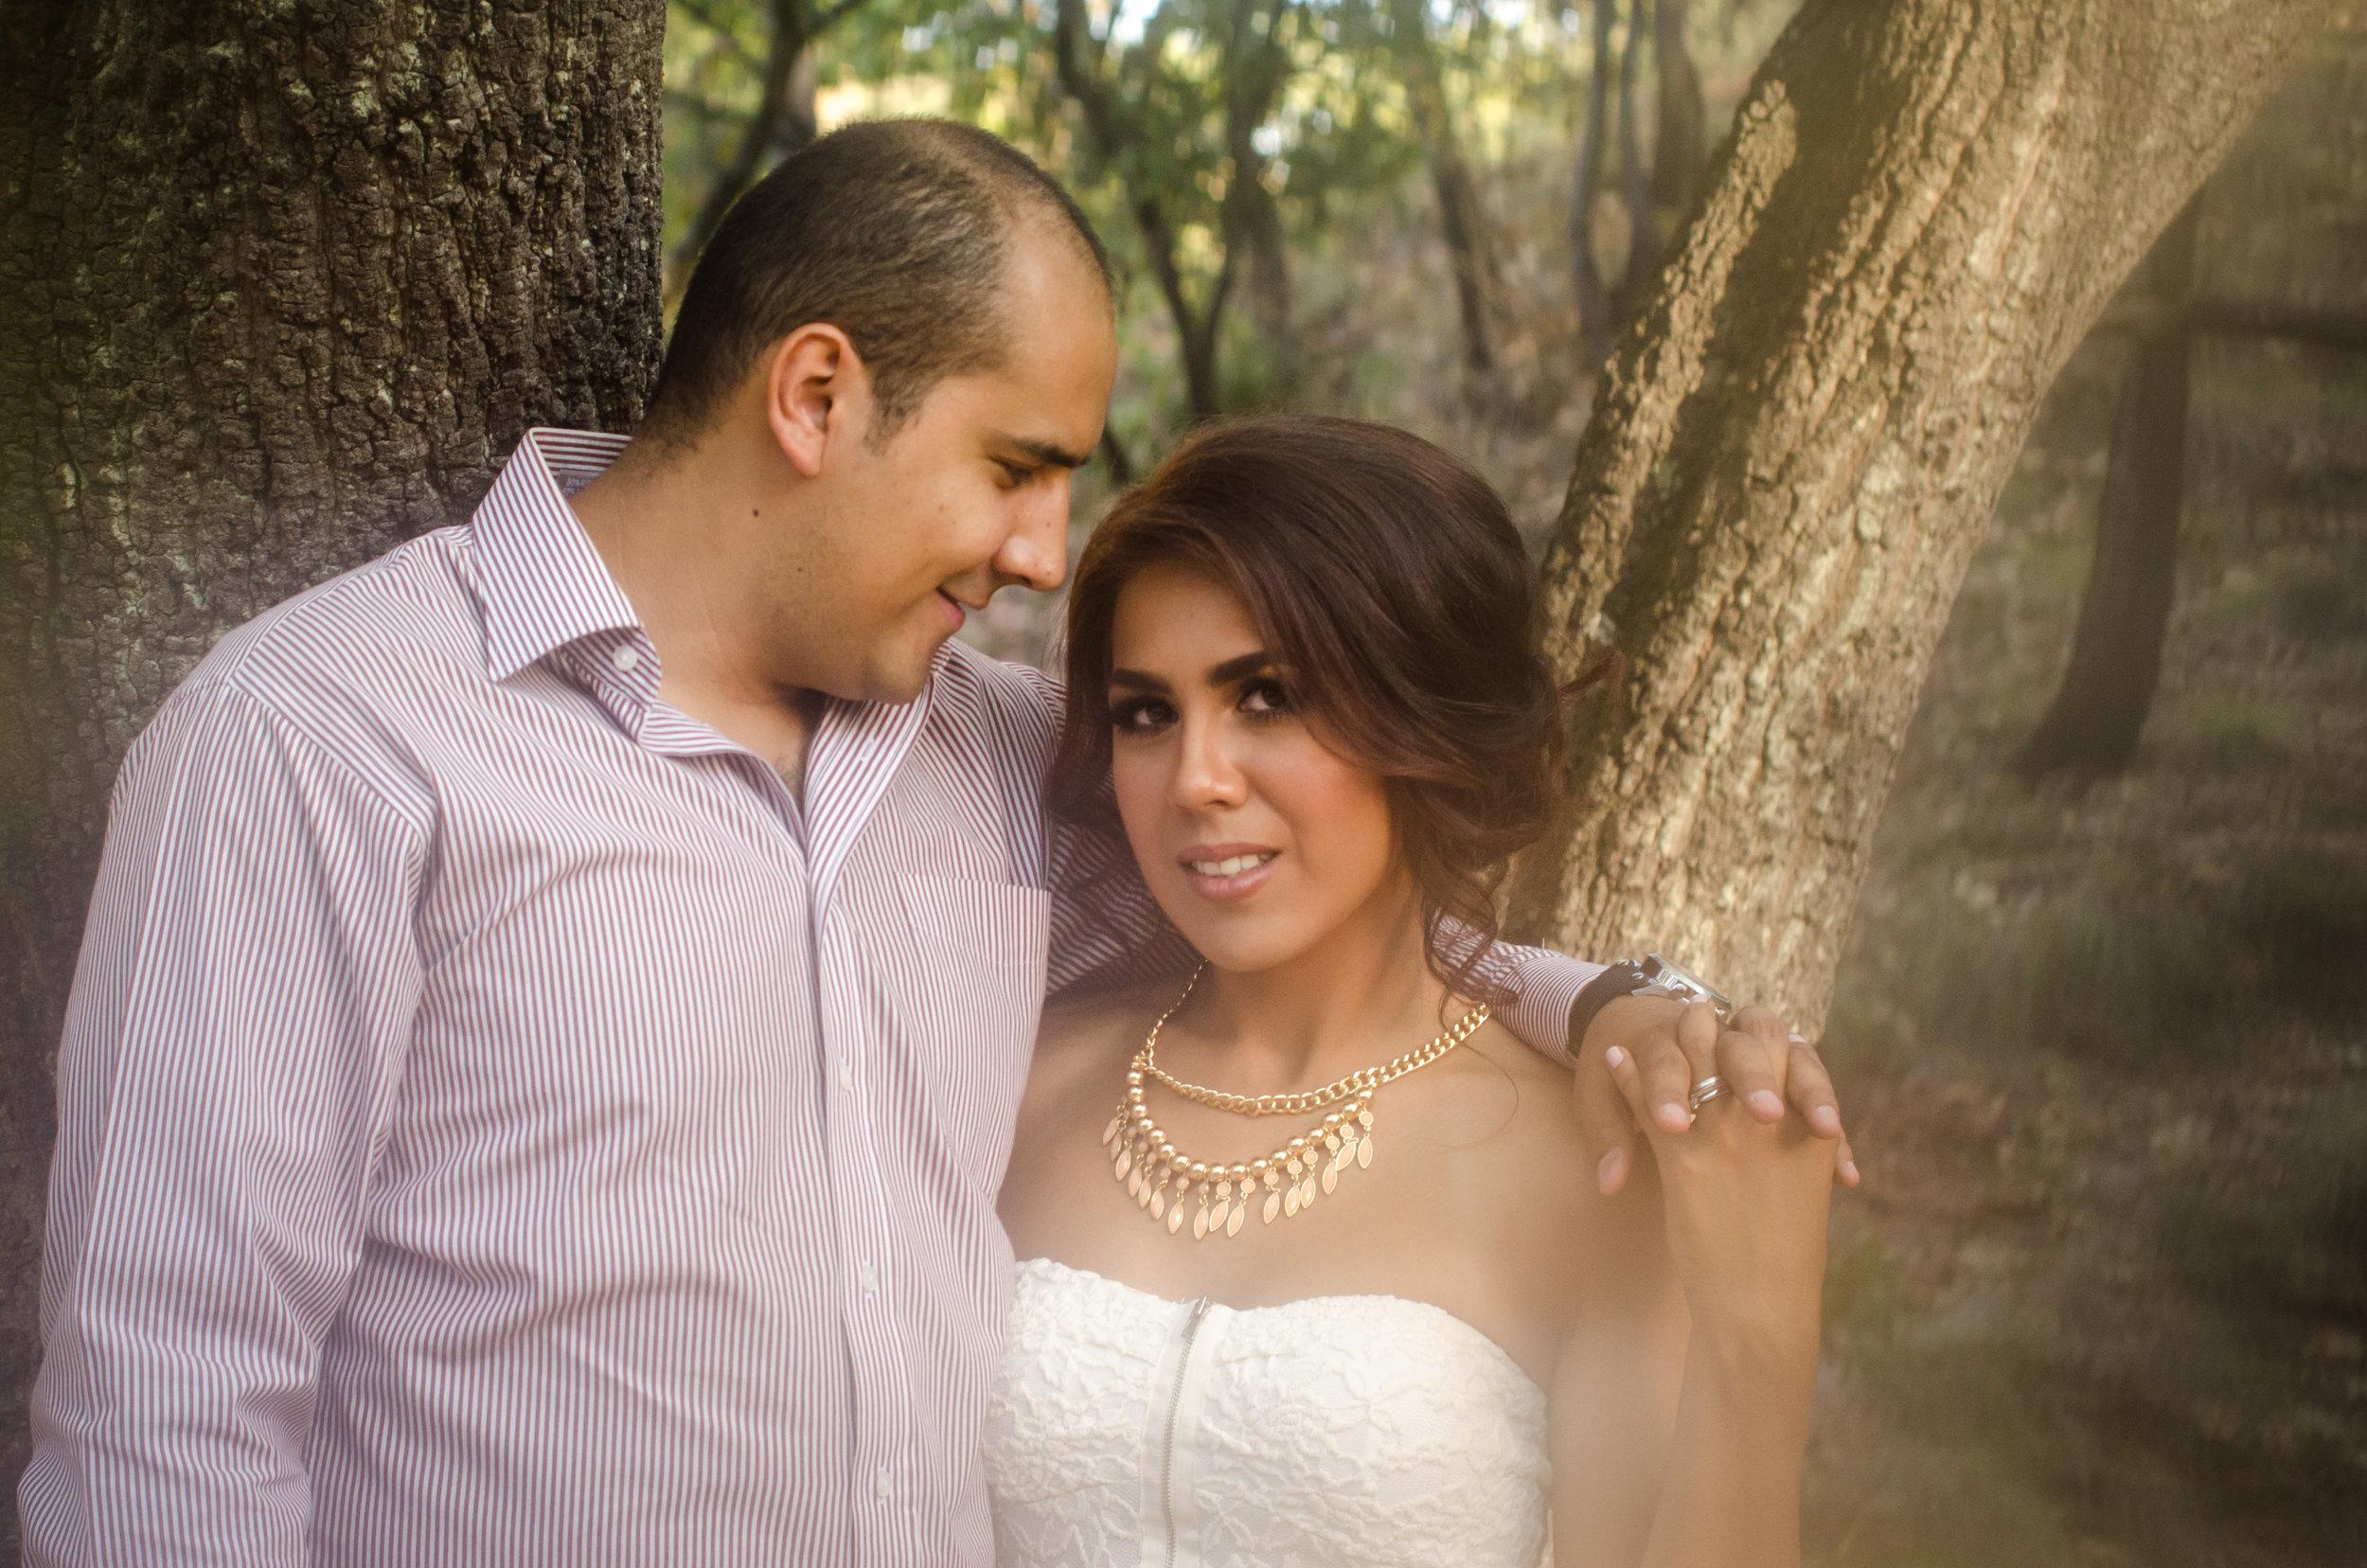 amazing couple's portrait on the woods